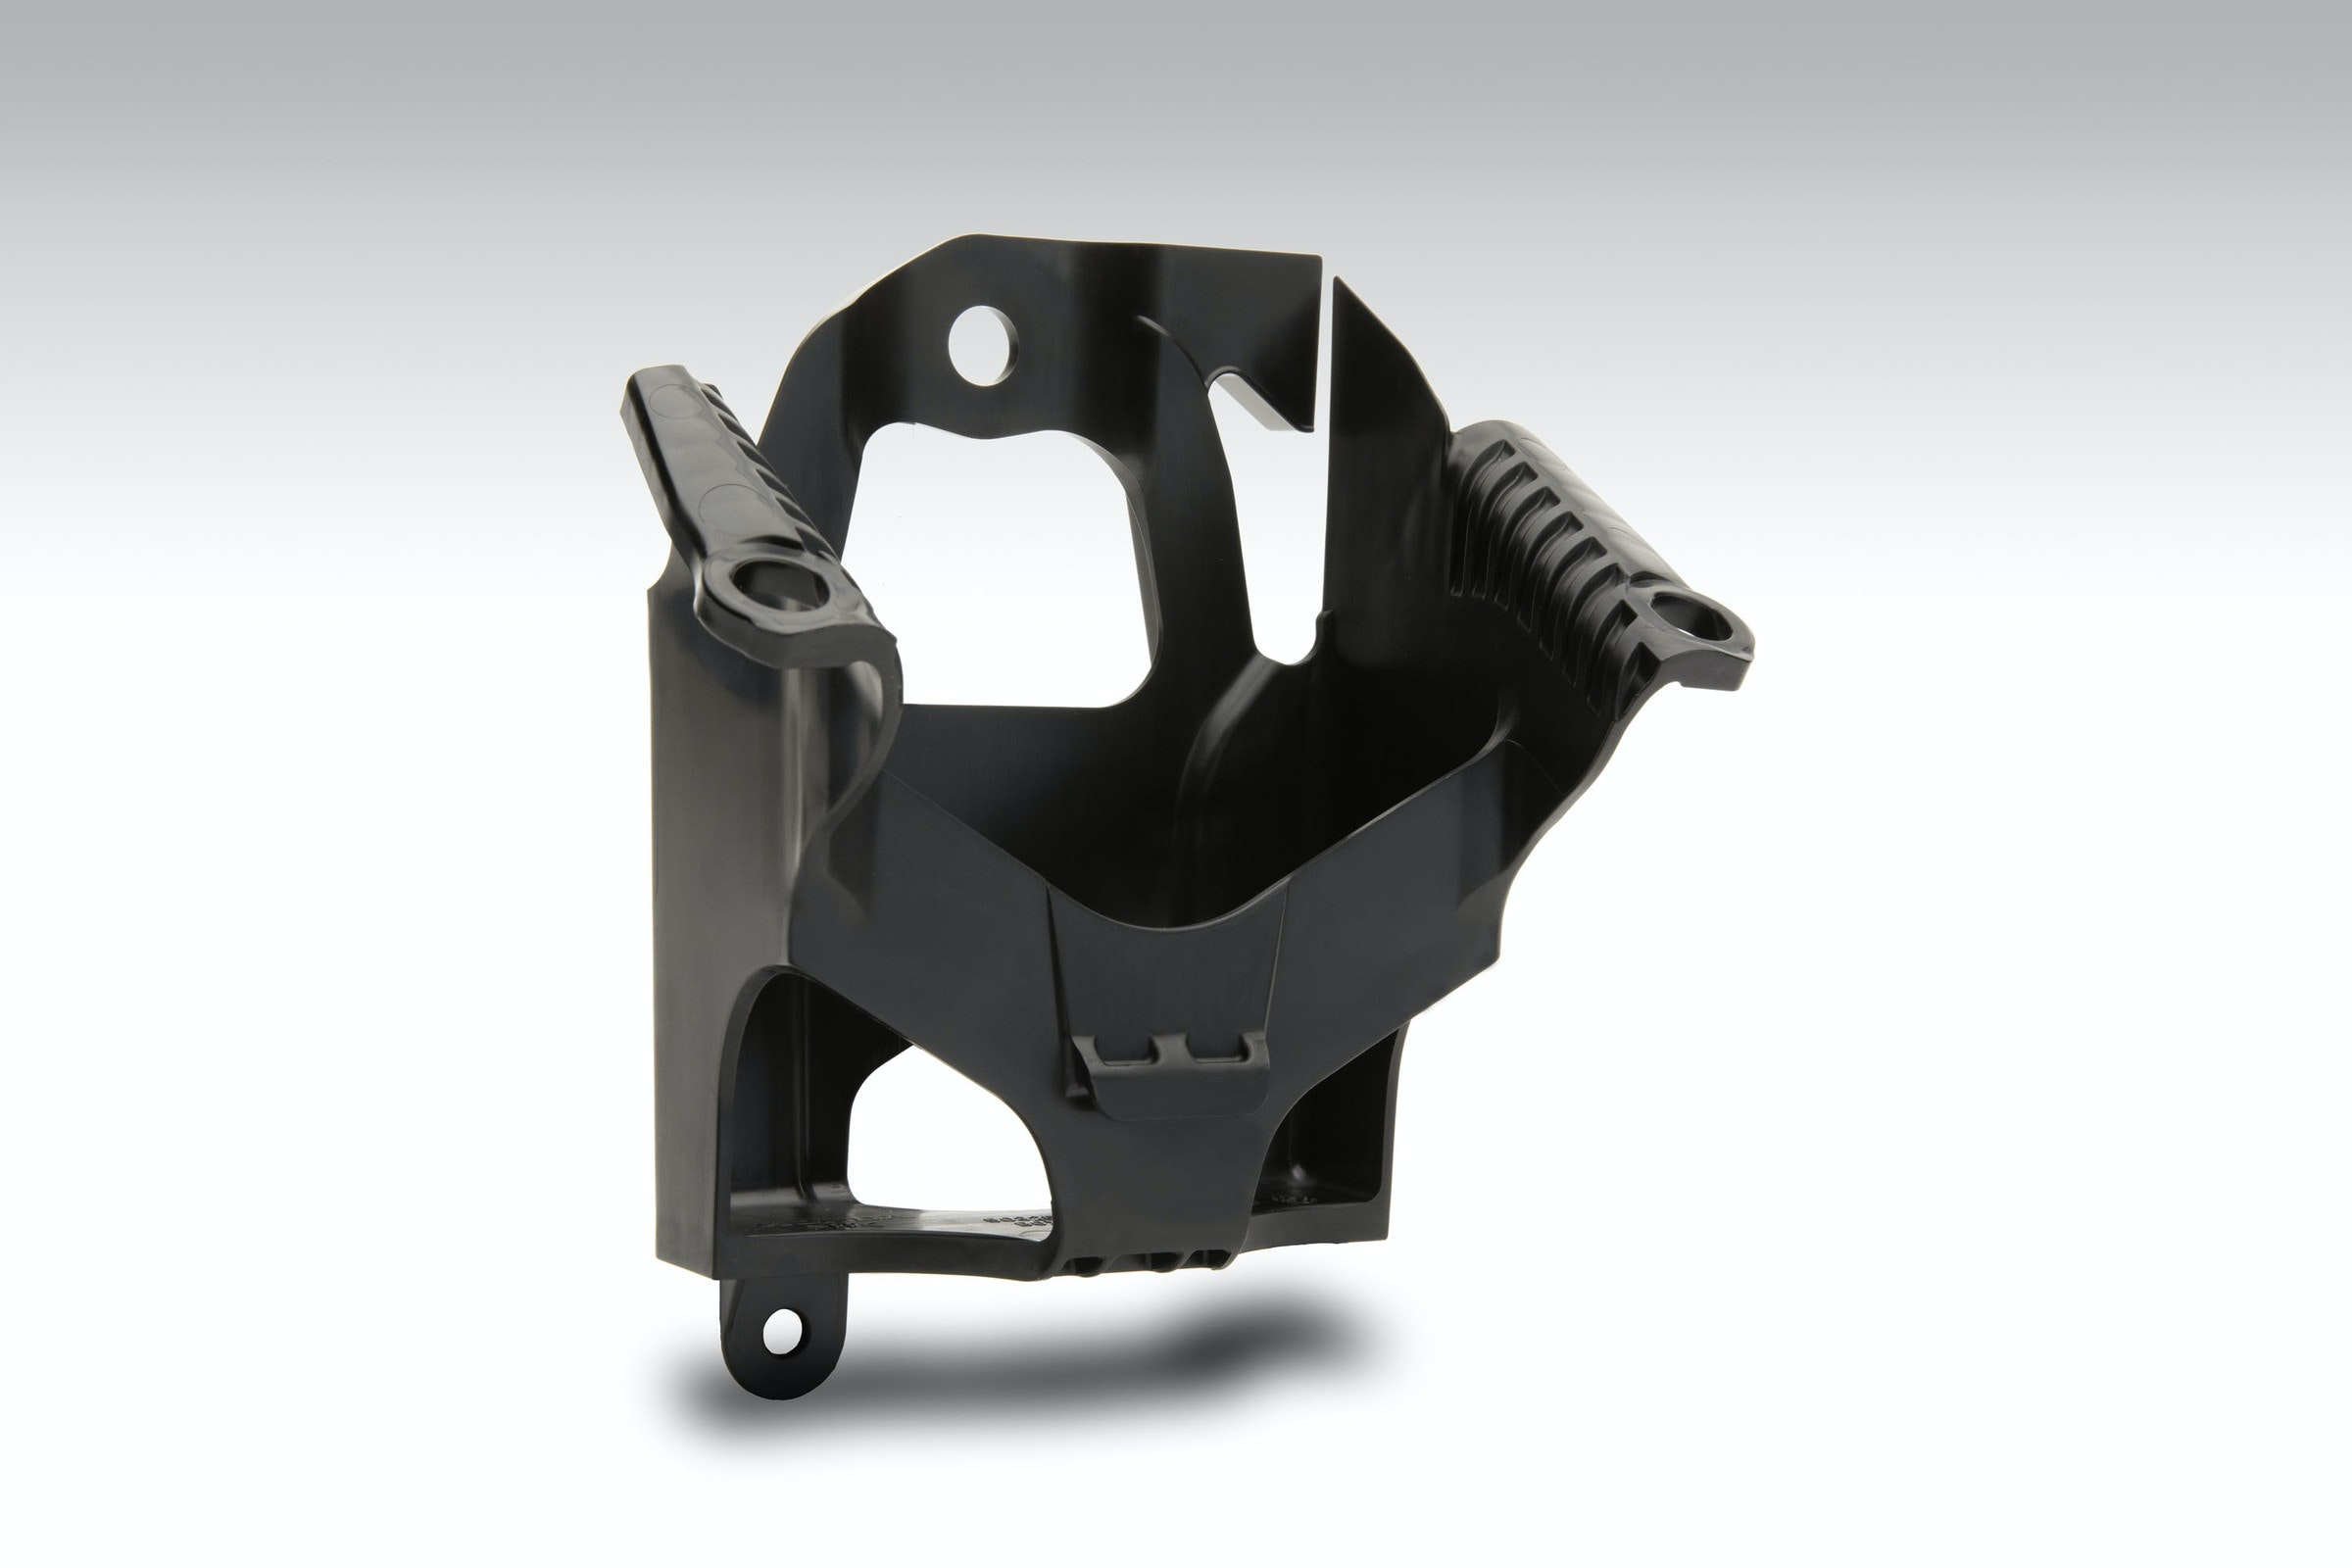 20_Honda_CRF450R_battery_holder